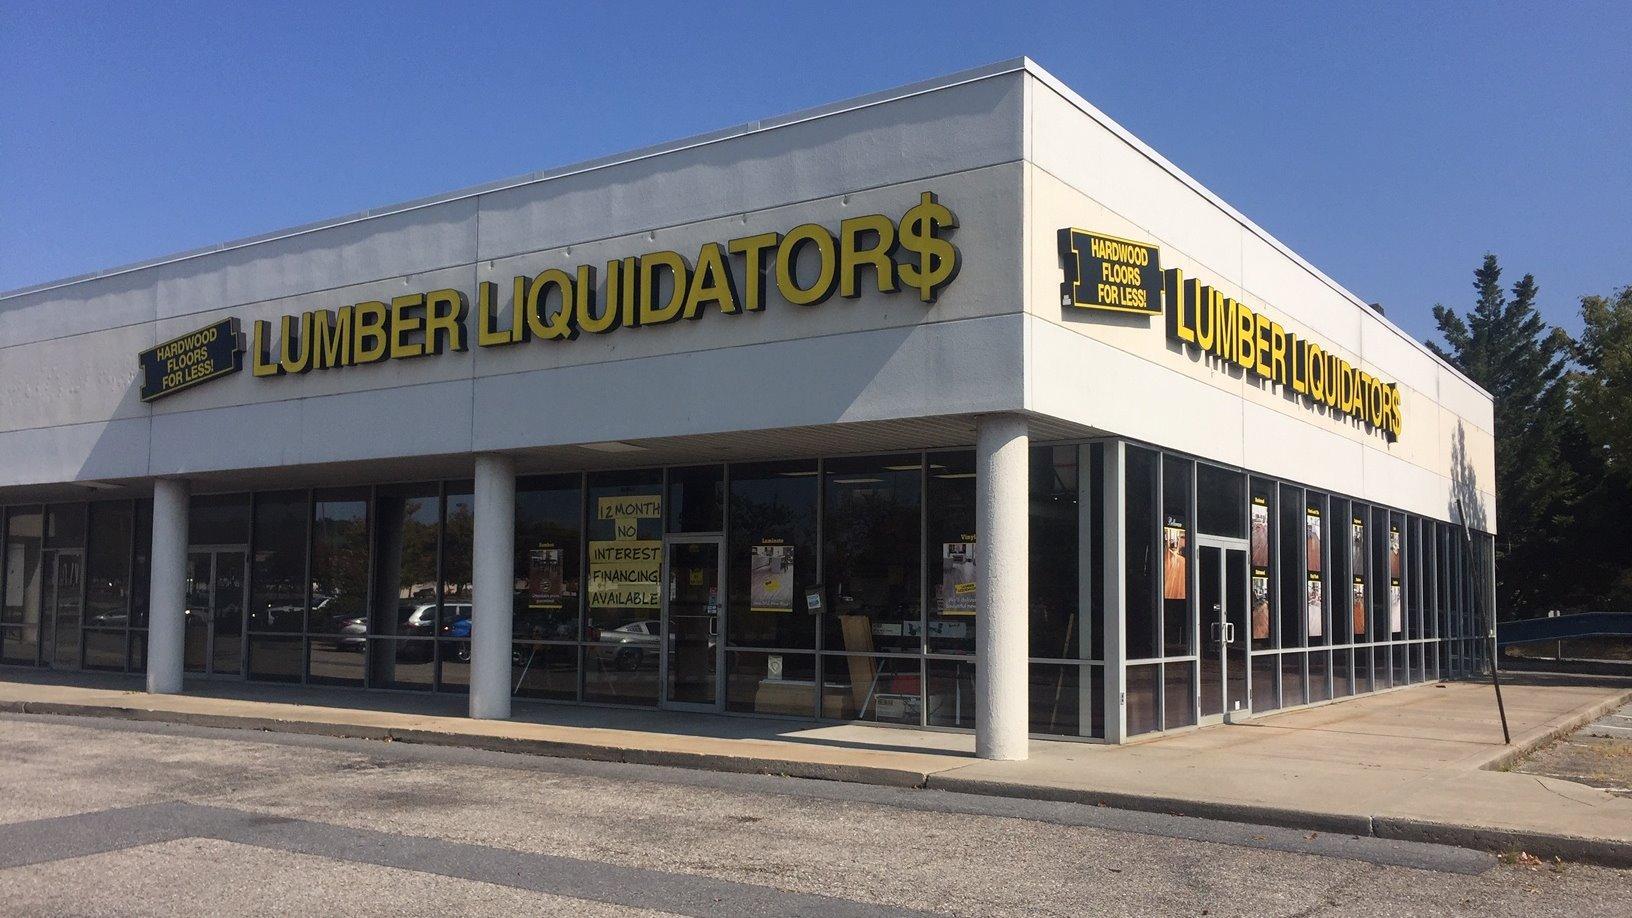 LL Flooring #1334 Glen Burnie | 585-A East Ordnance Rd | Storefront